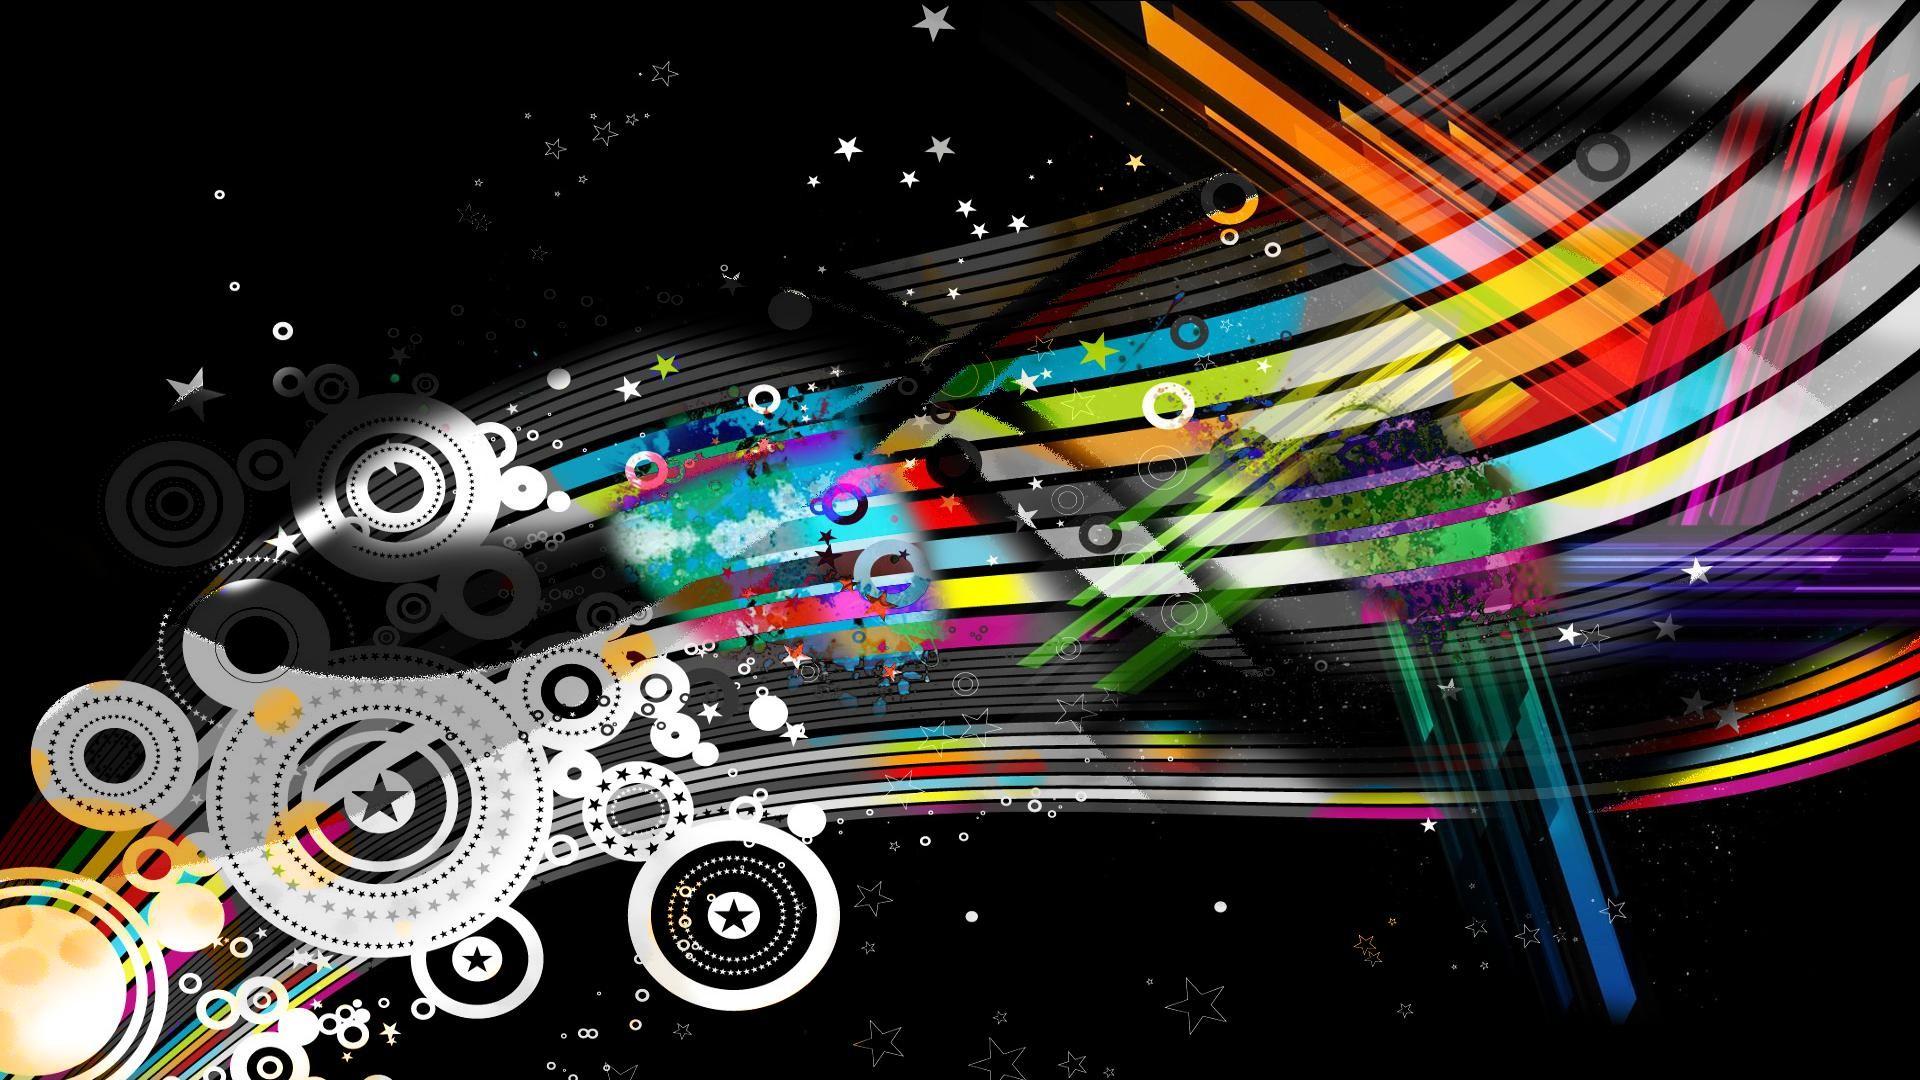 Music Girl HD Wallpapers in HD | Ultra HD Abstract Wallpapers | Pinterest |  Hd wallpaper